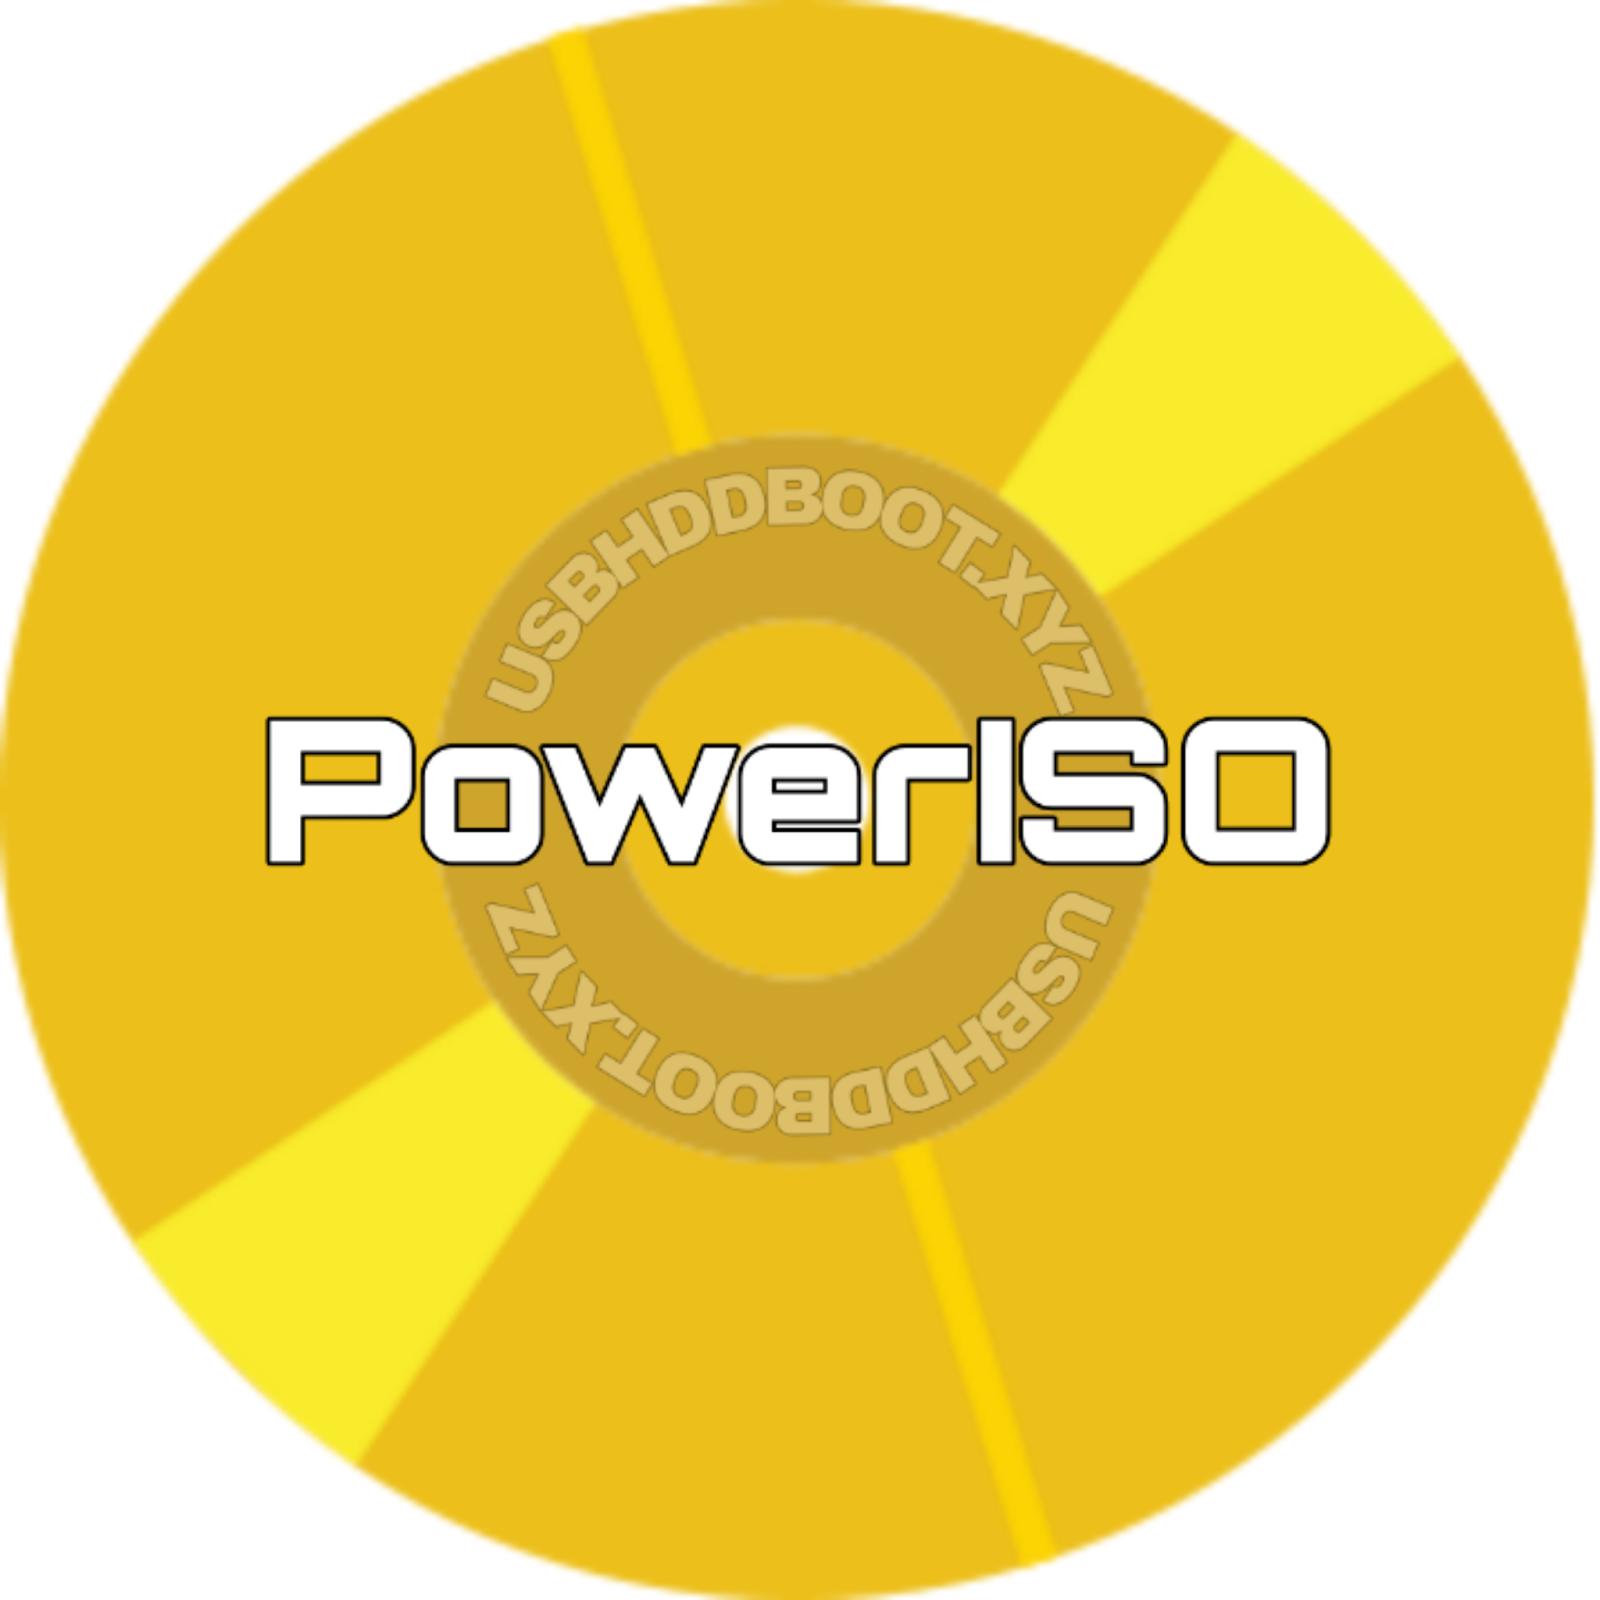 Download PowerISO mới nhất v7.9 Full - USBHDDBOOT.XYZ